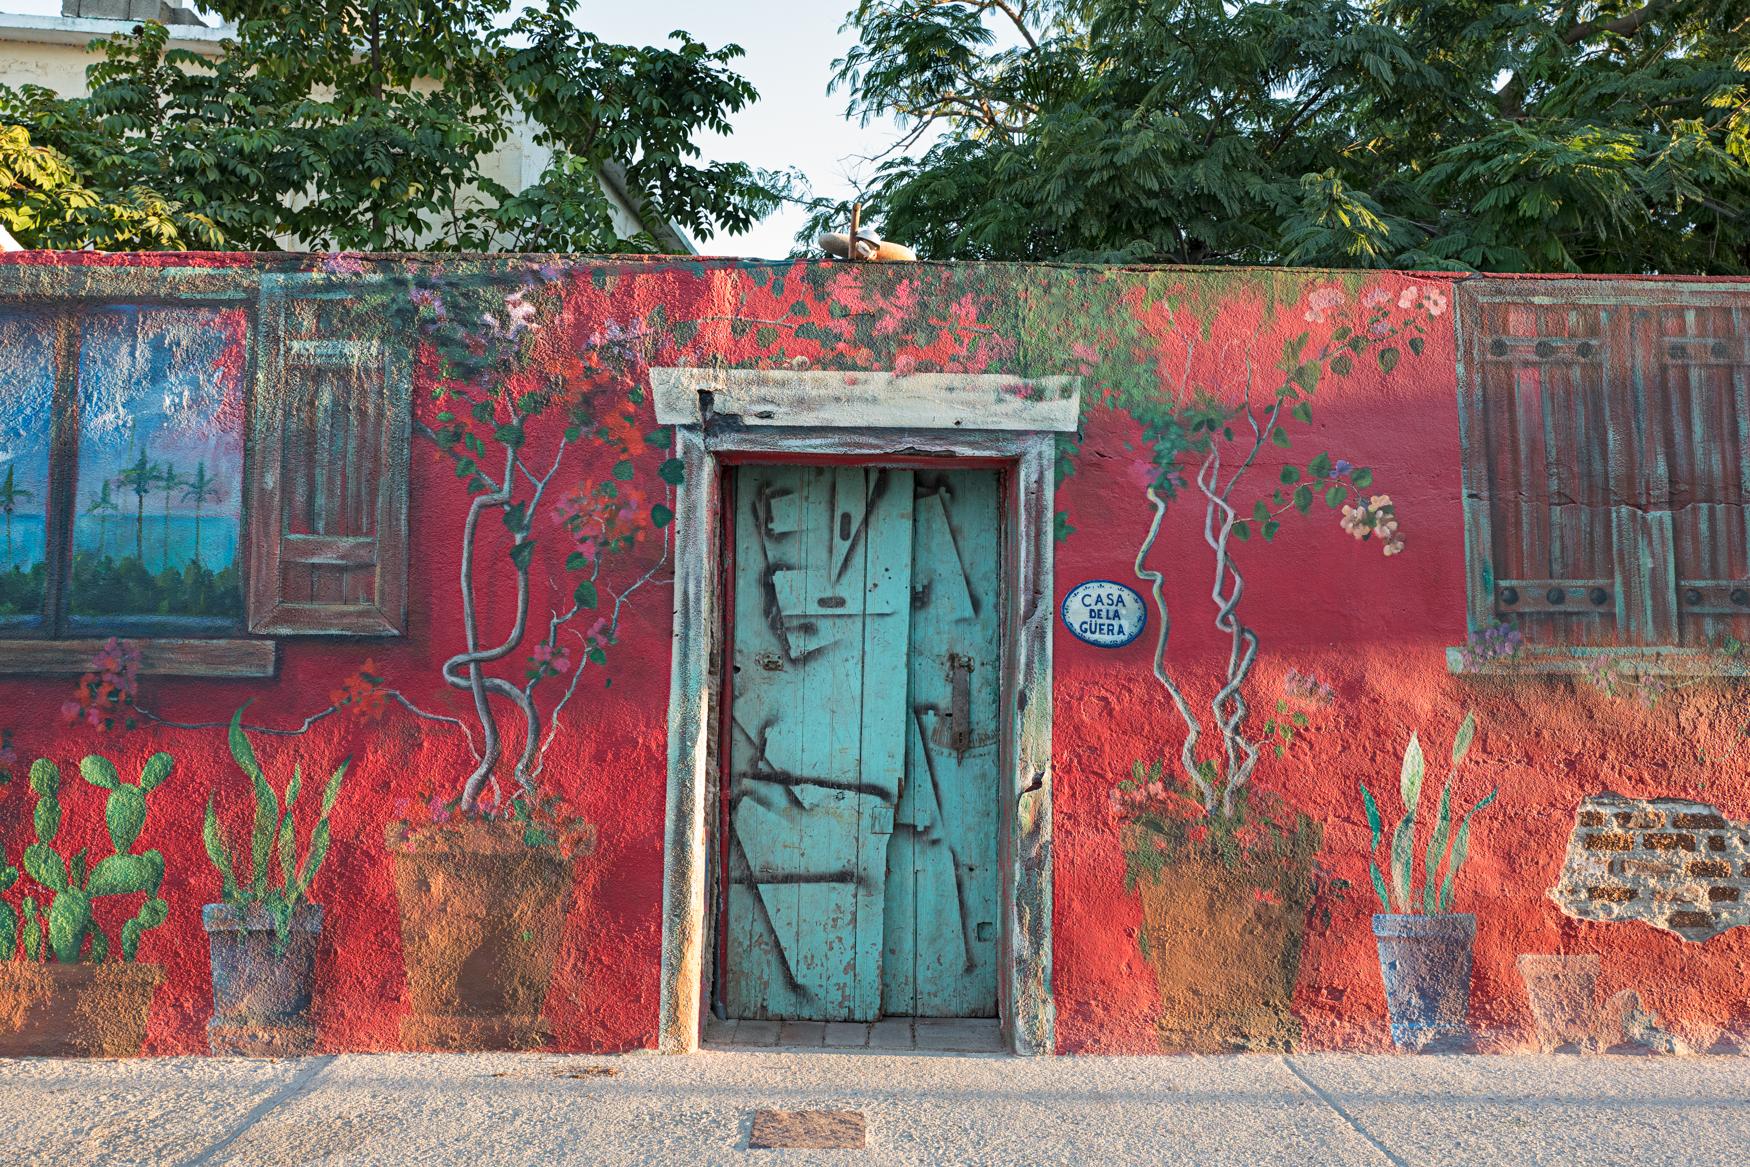 Street Art in San Jose del Cabo